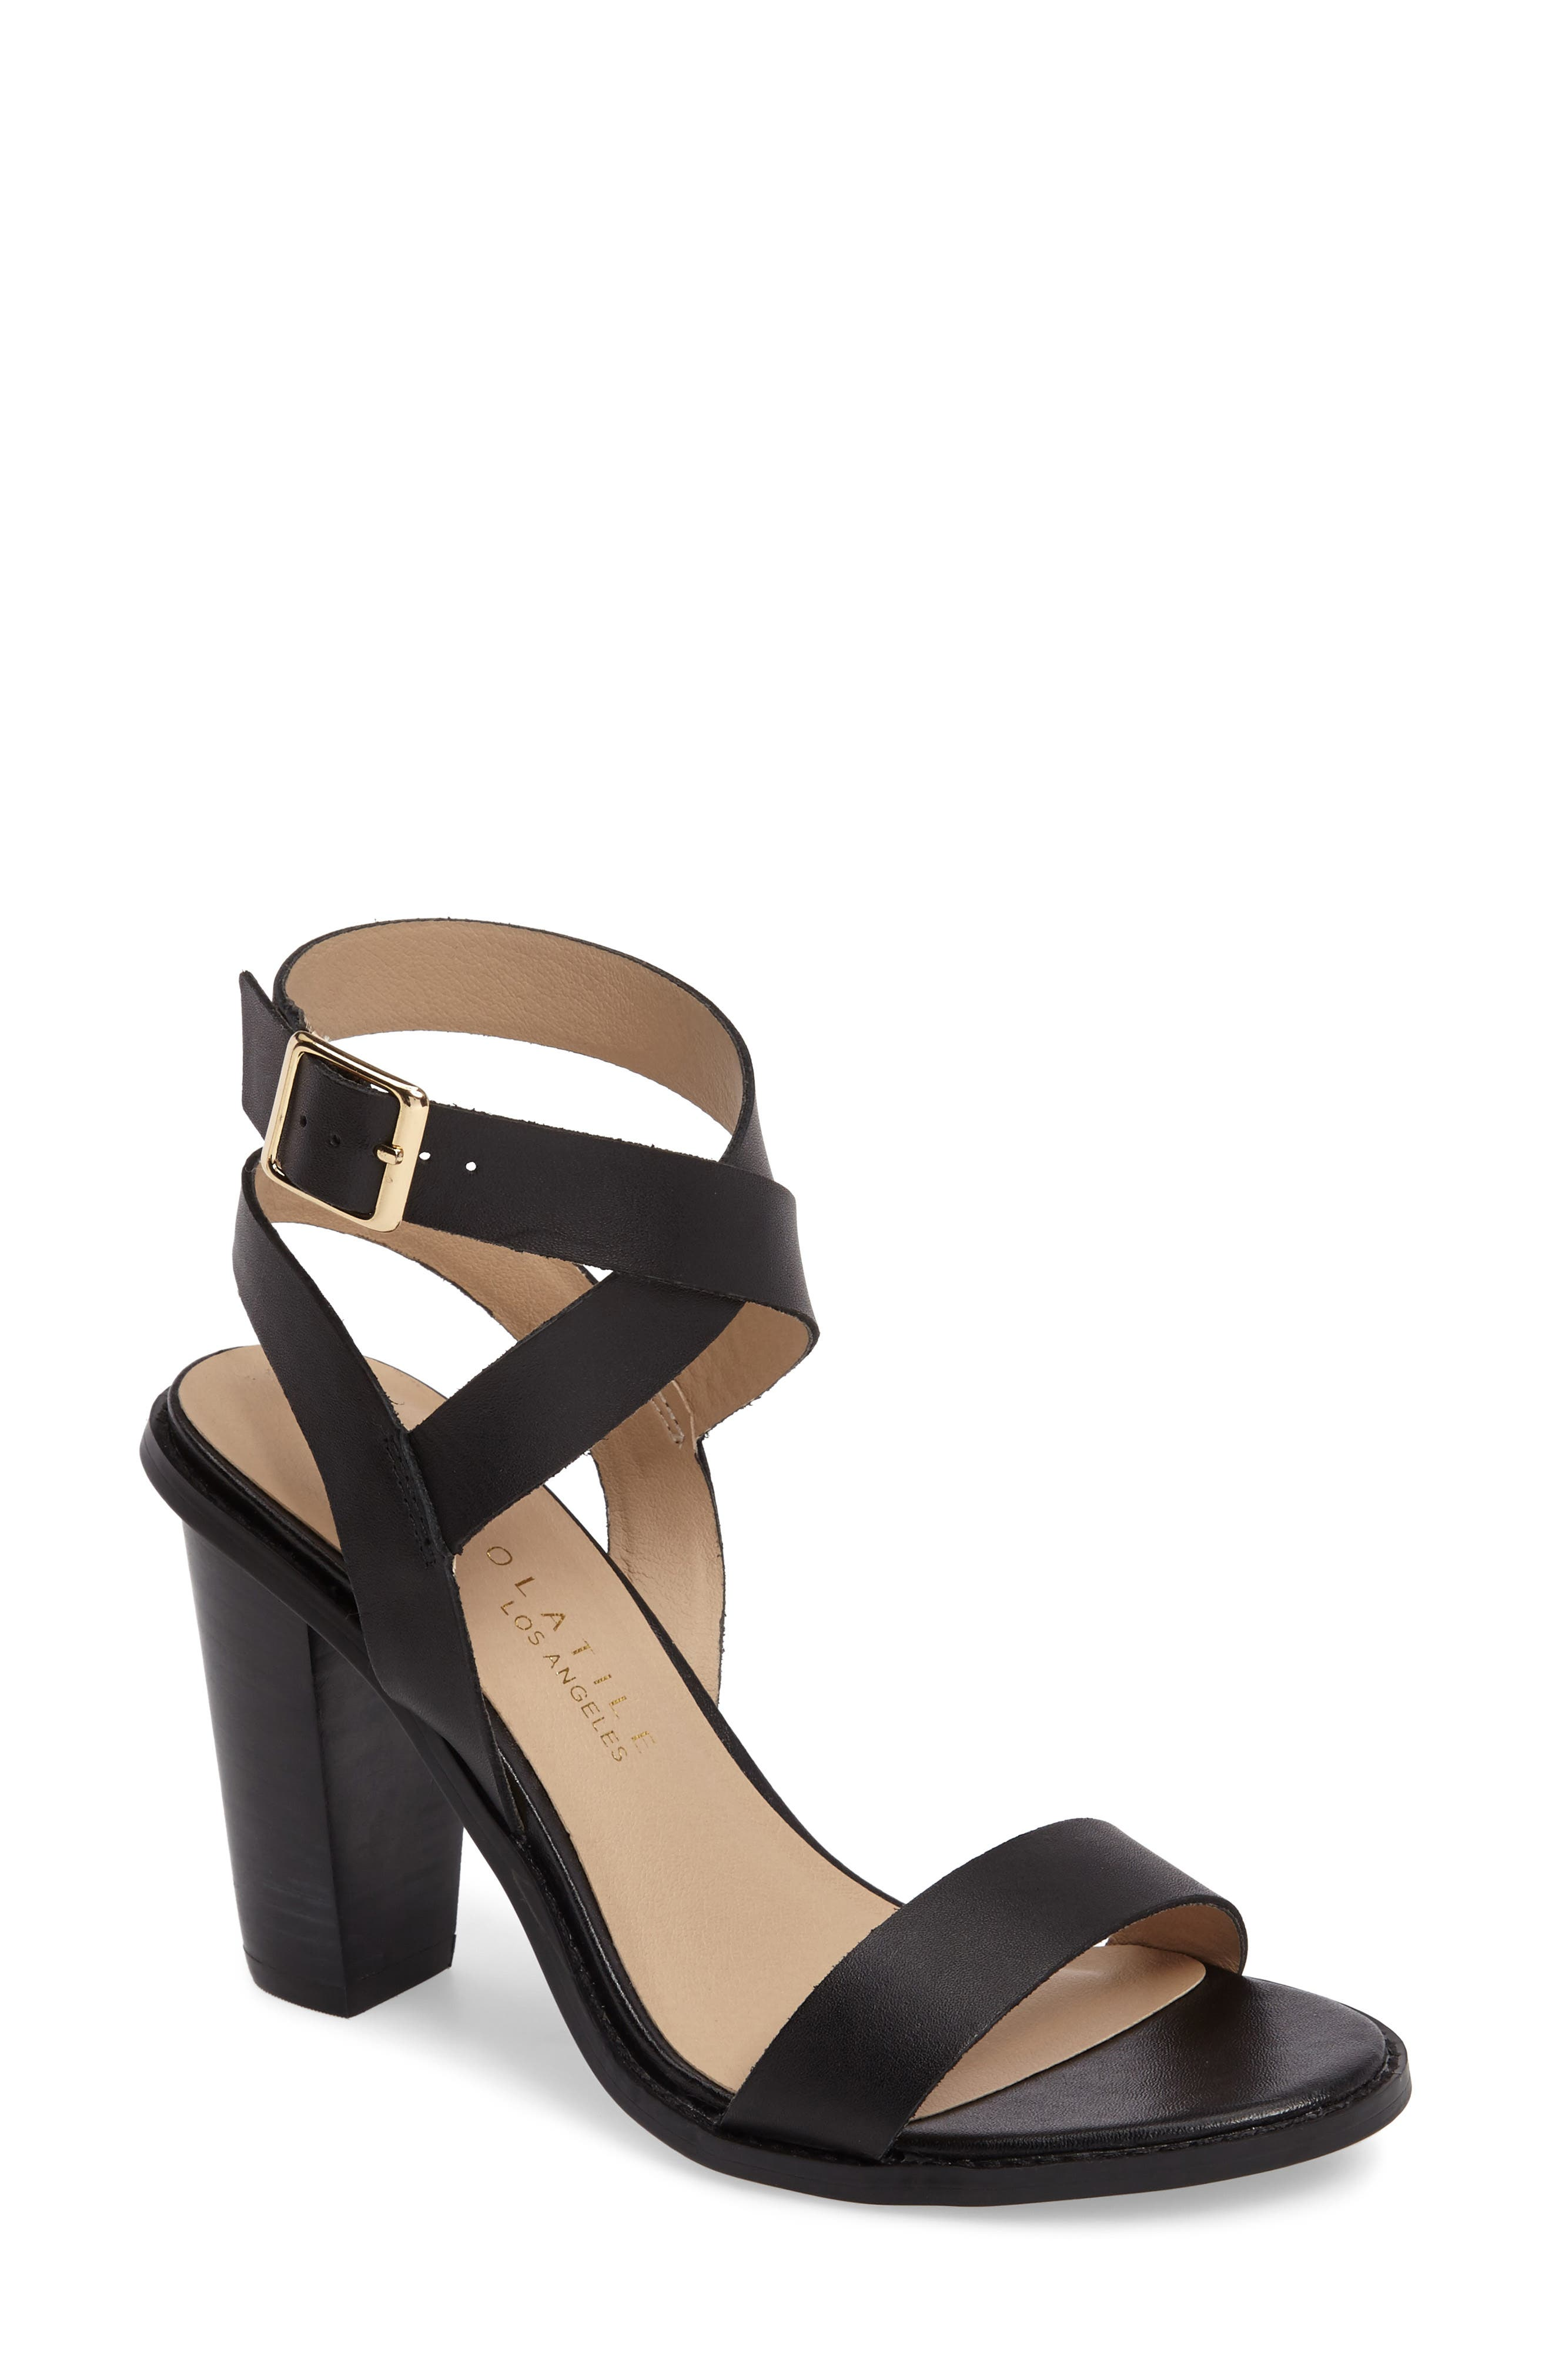 Poshy Ankle Wrap Sandal,                             Main thumbnail 1, color,                             BLACK LEATHER